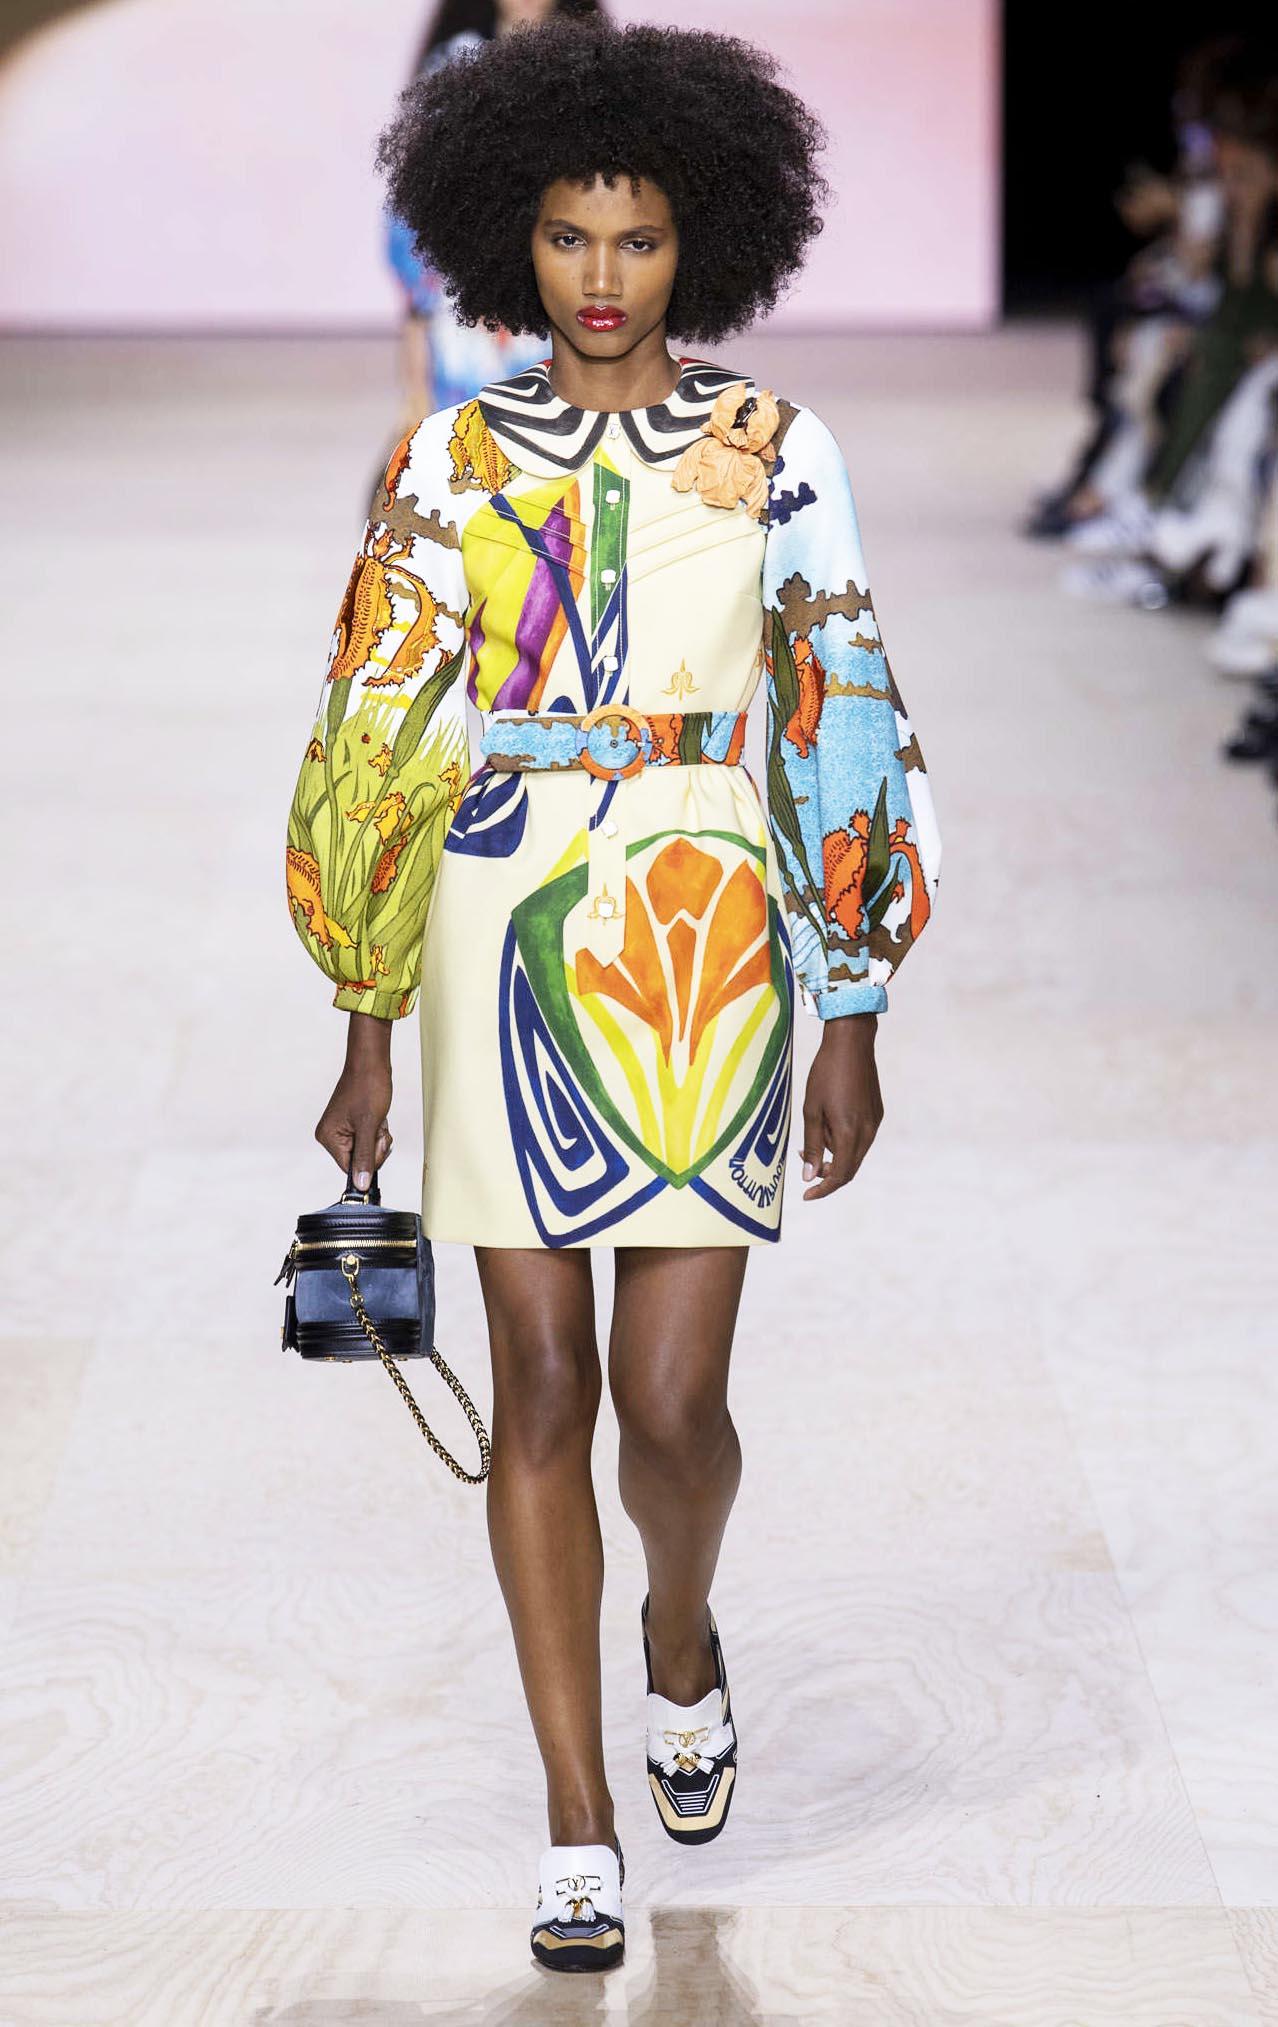 Louis Vuitton Spring-Summer 2020